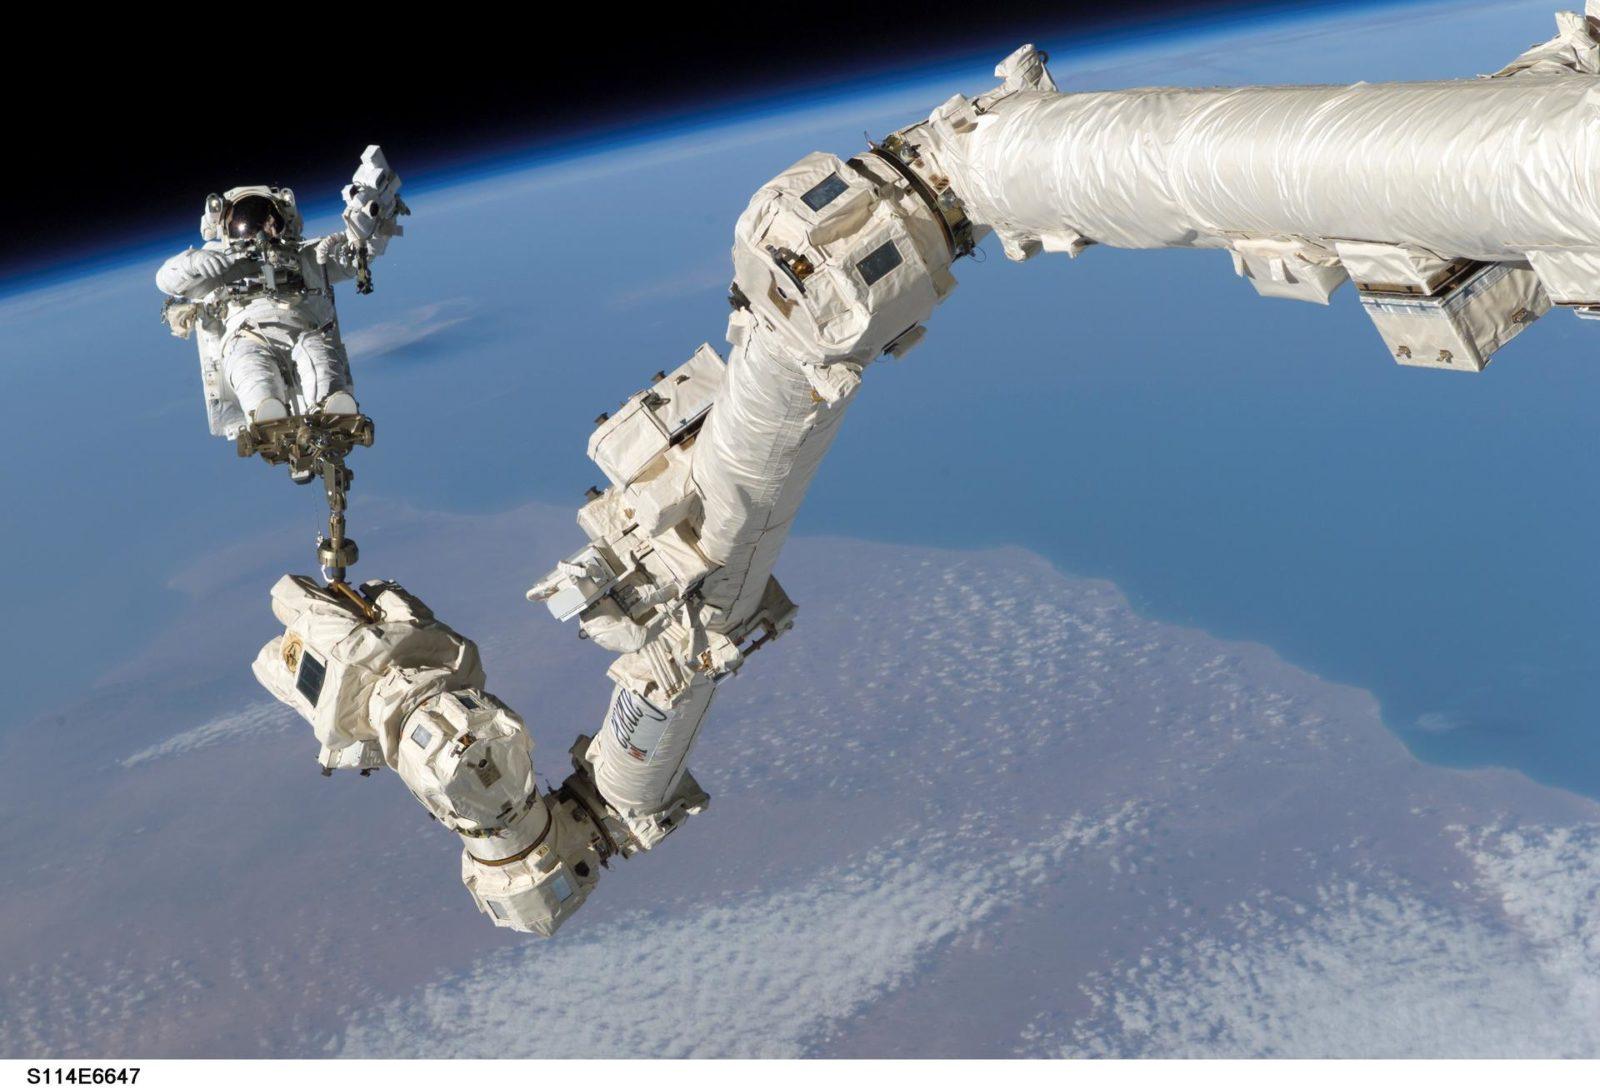 EVA 3 - Robinson on Canadarm2